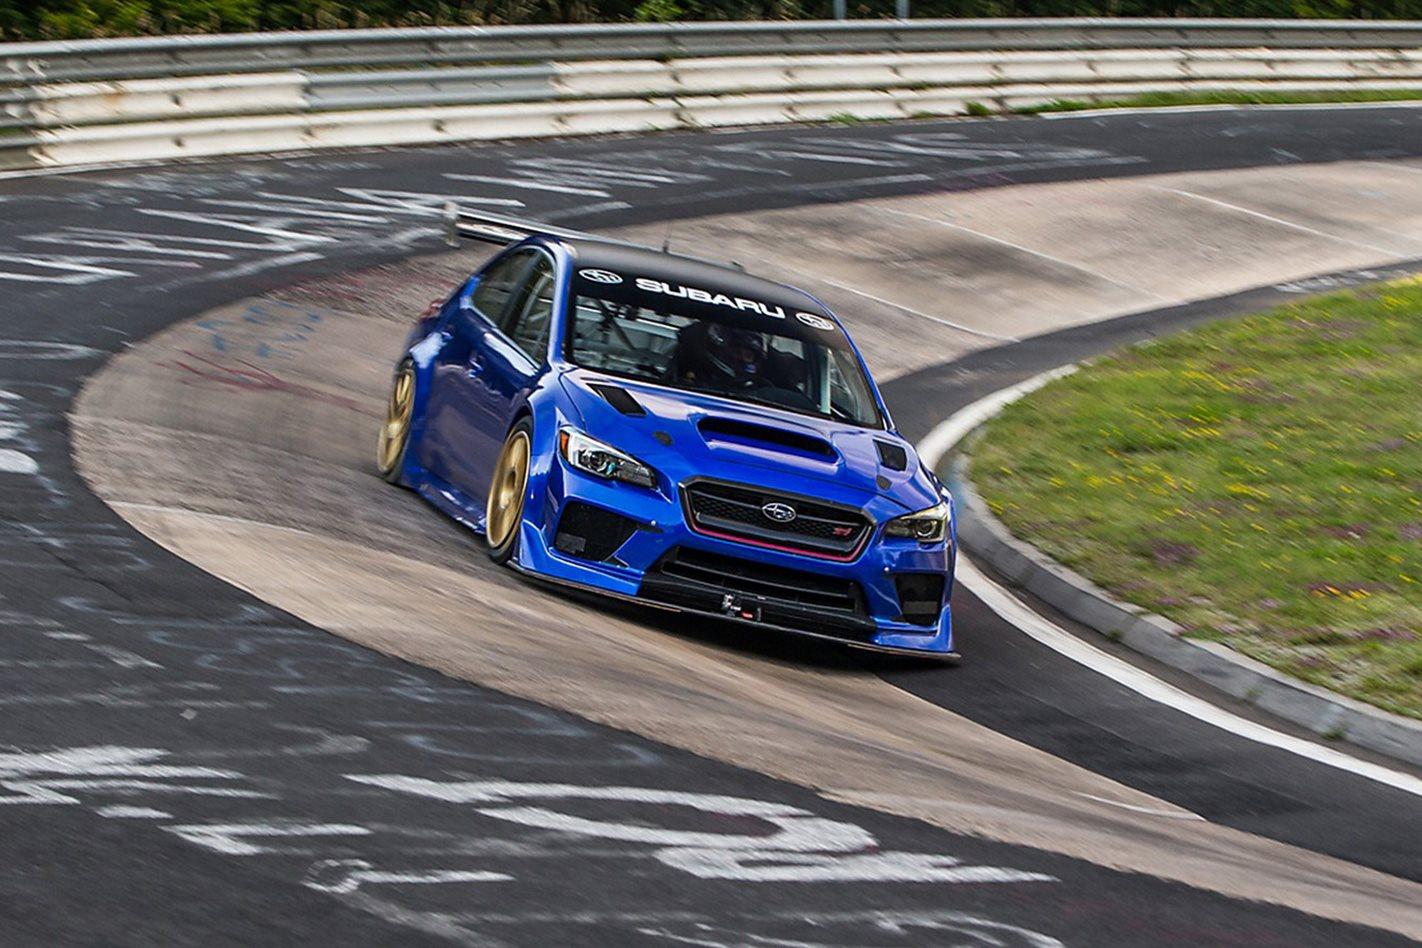 Subaru-WRX-STi-Type-RA-NBR-Special-Nurburgring-lap.jpg